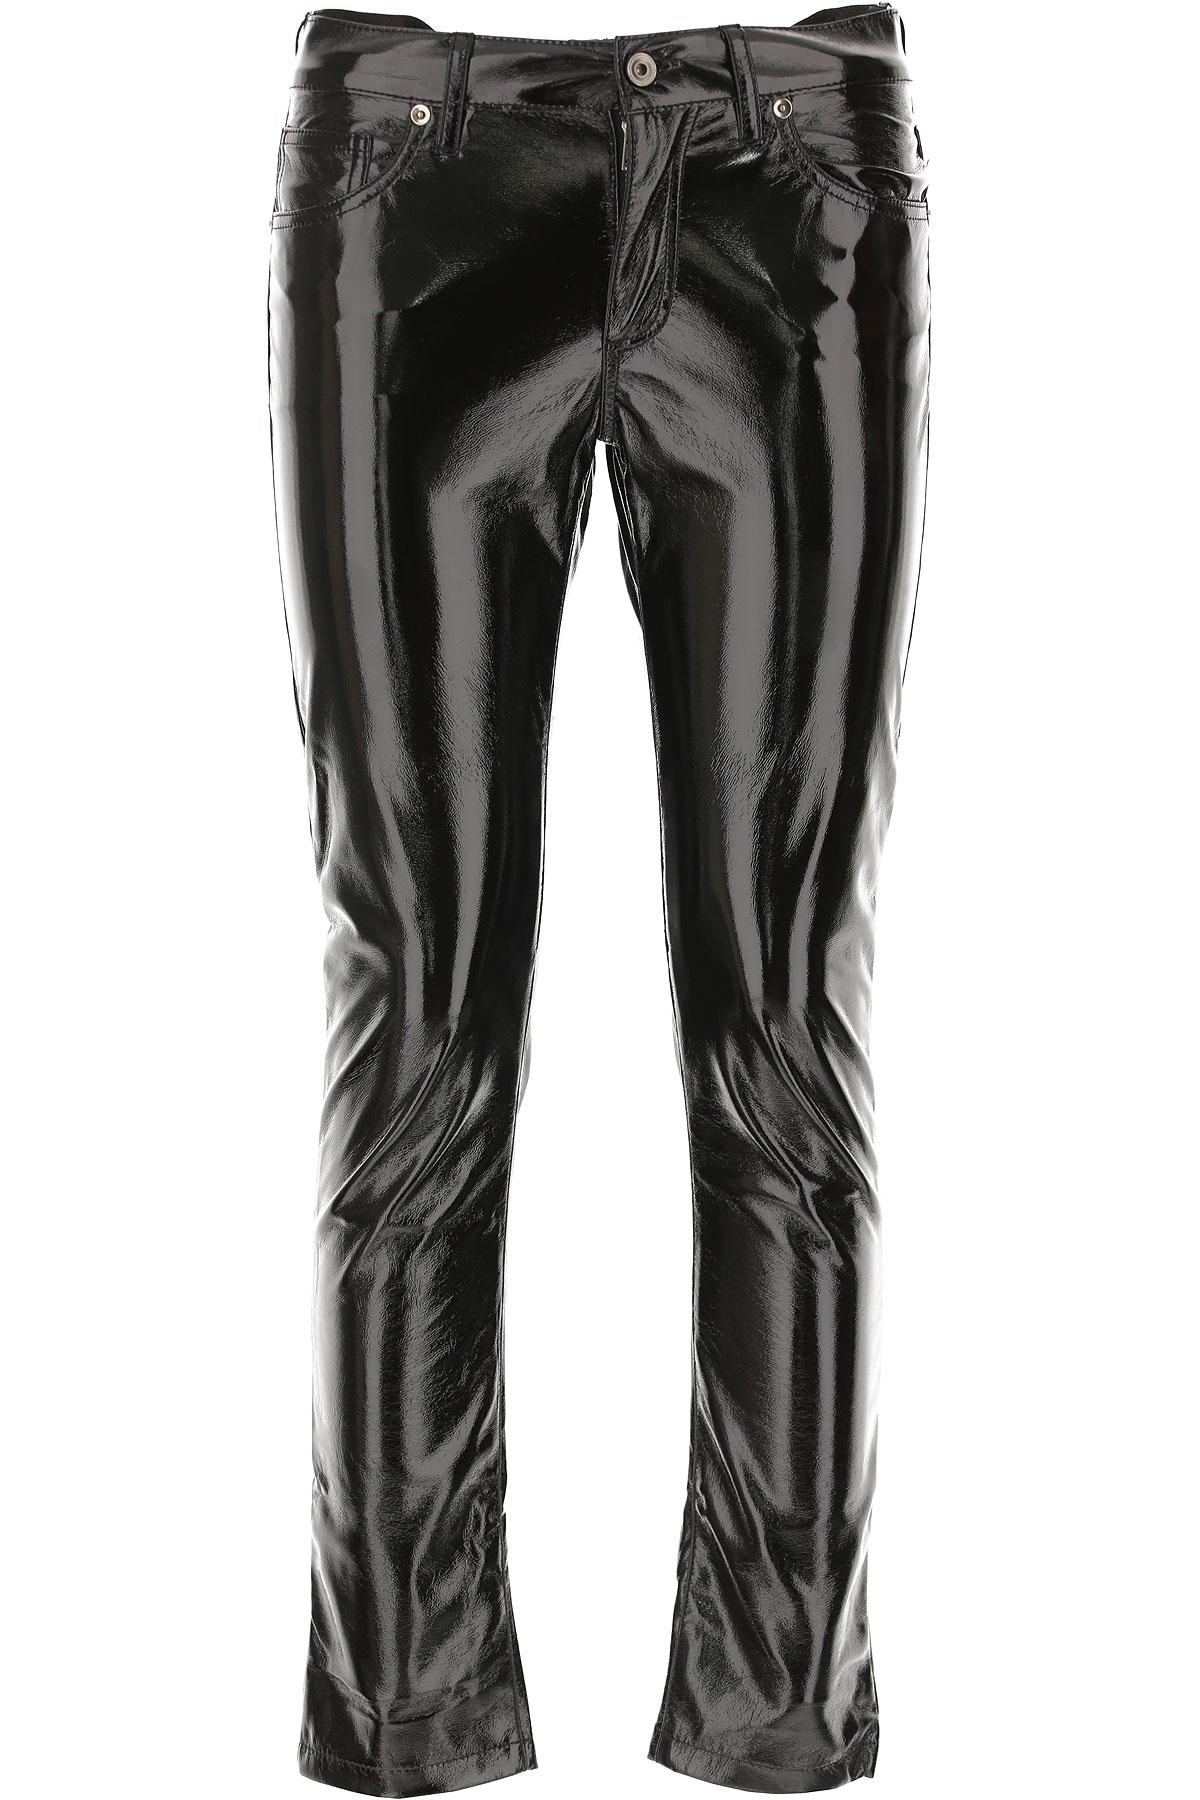 Image of Laneus Pants for Women, Vinyl Black, polyester, 2017, 26 28 30